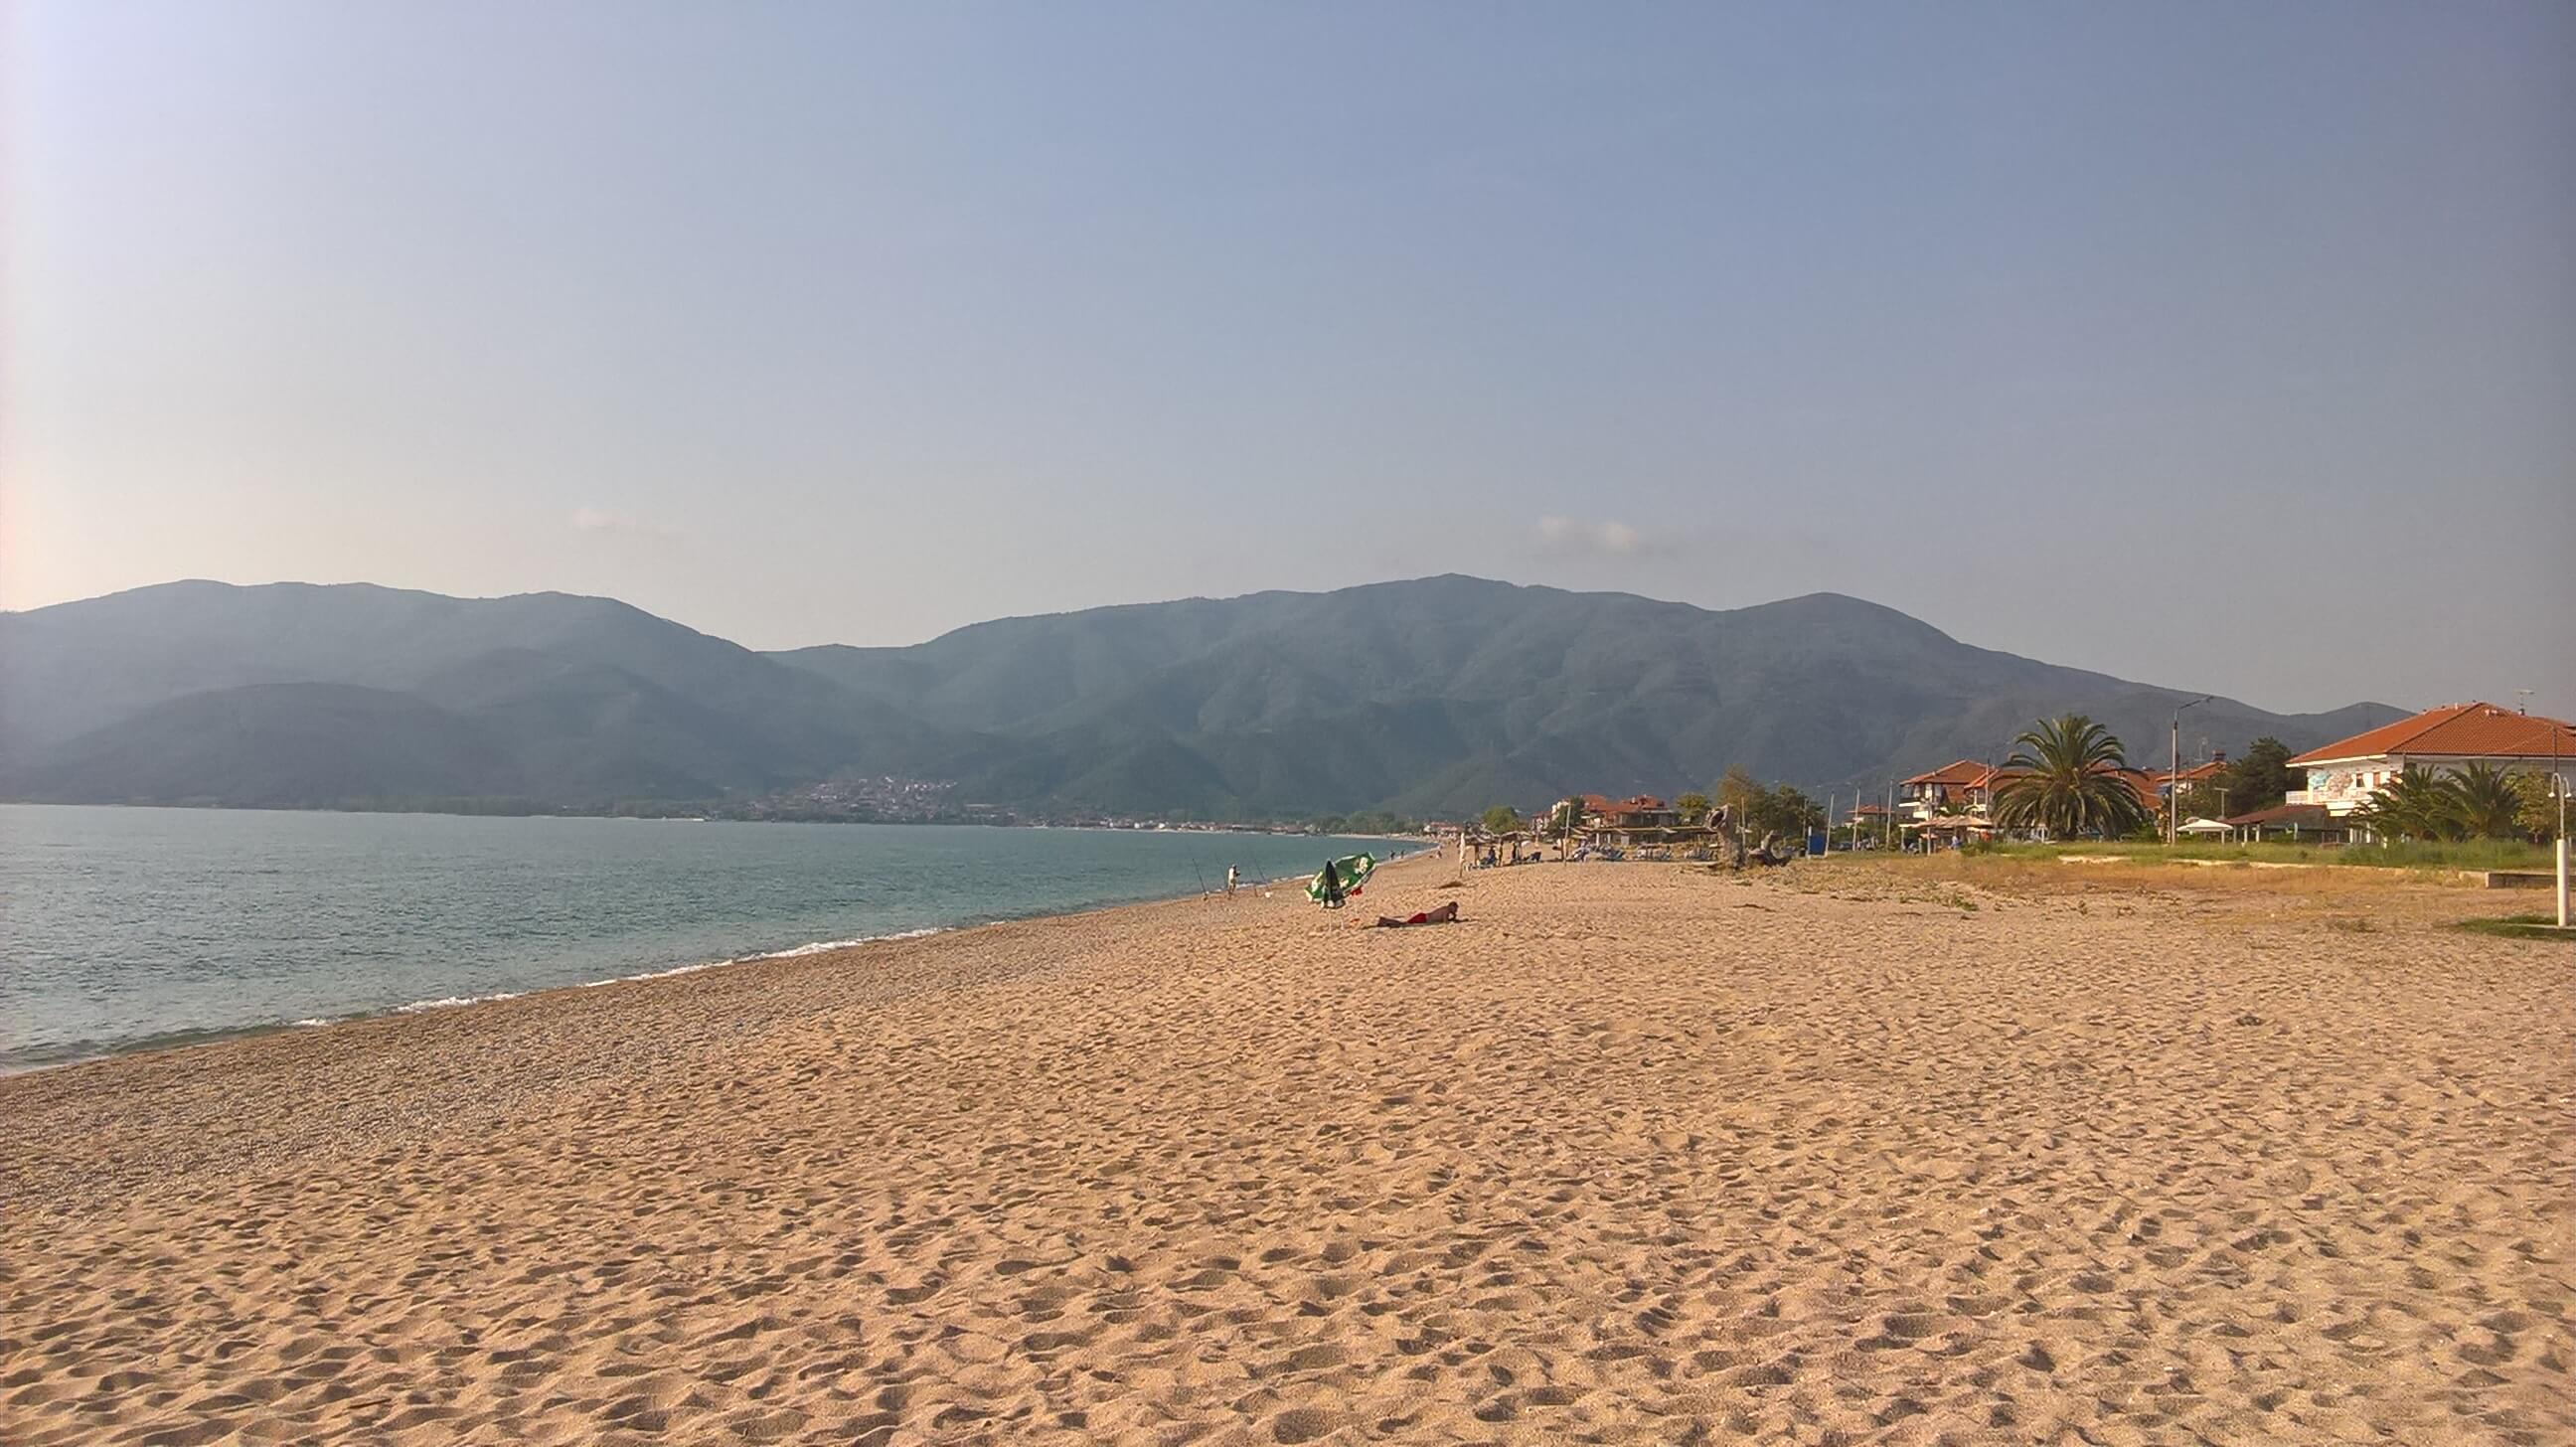 Plaja din Asprovalta - Halkidiki, Grecia